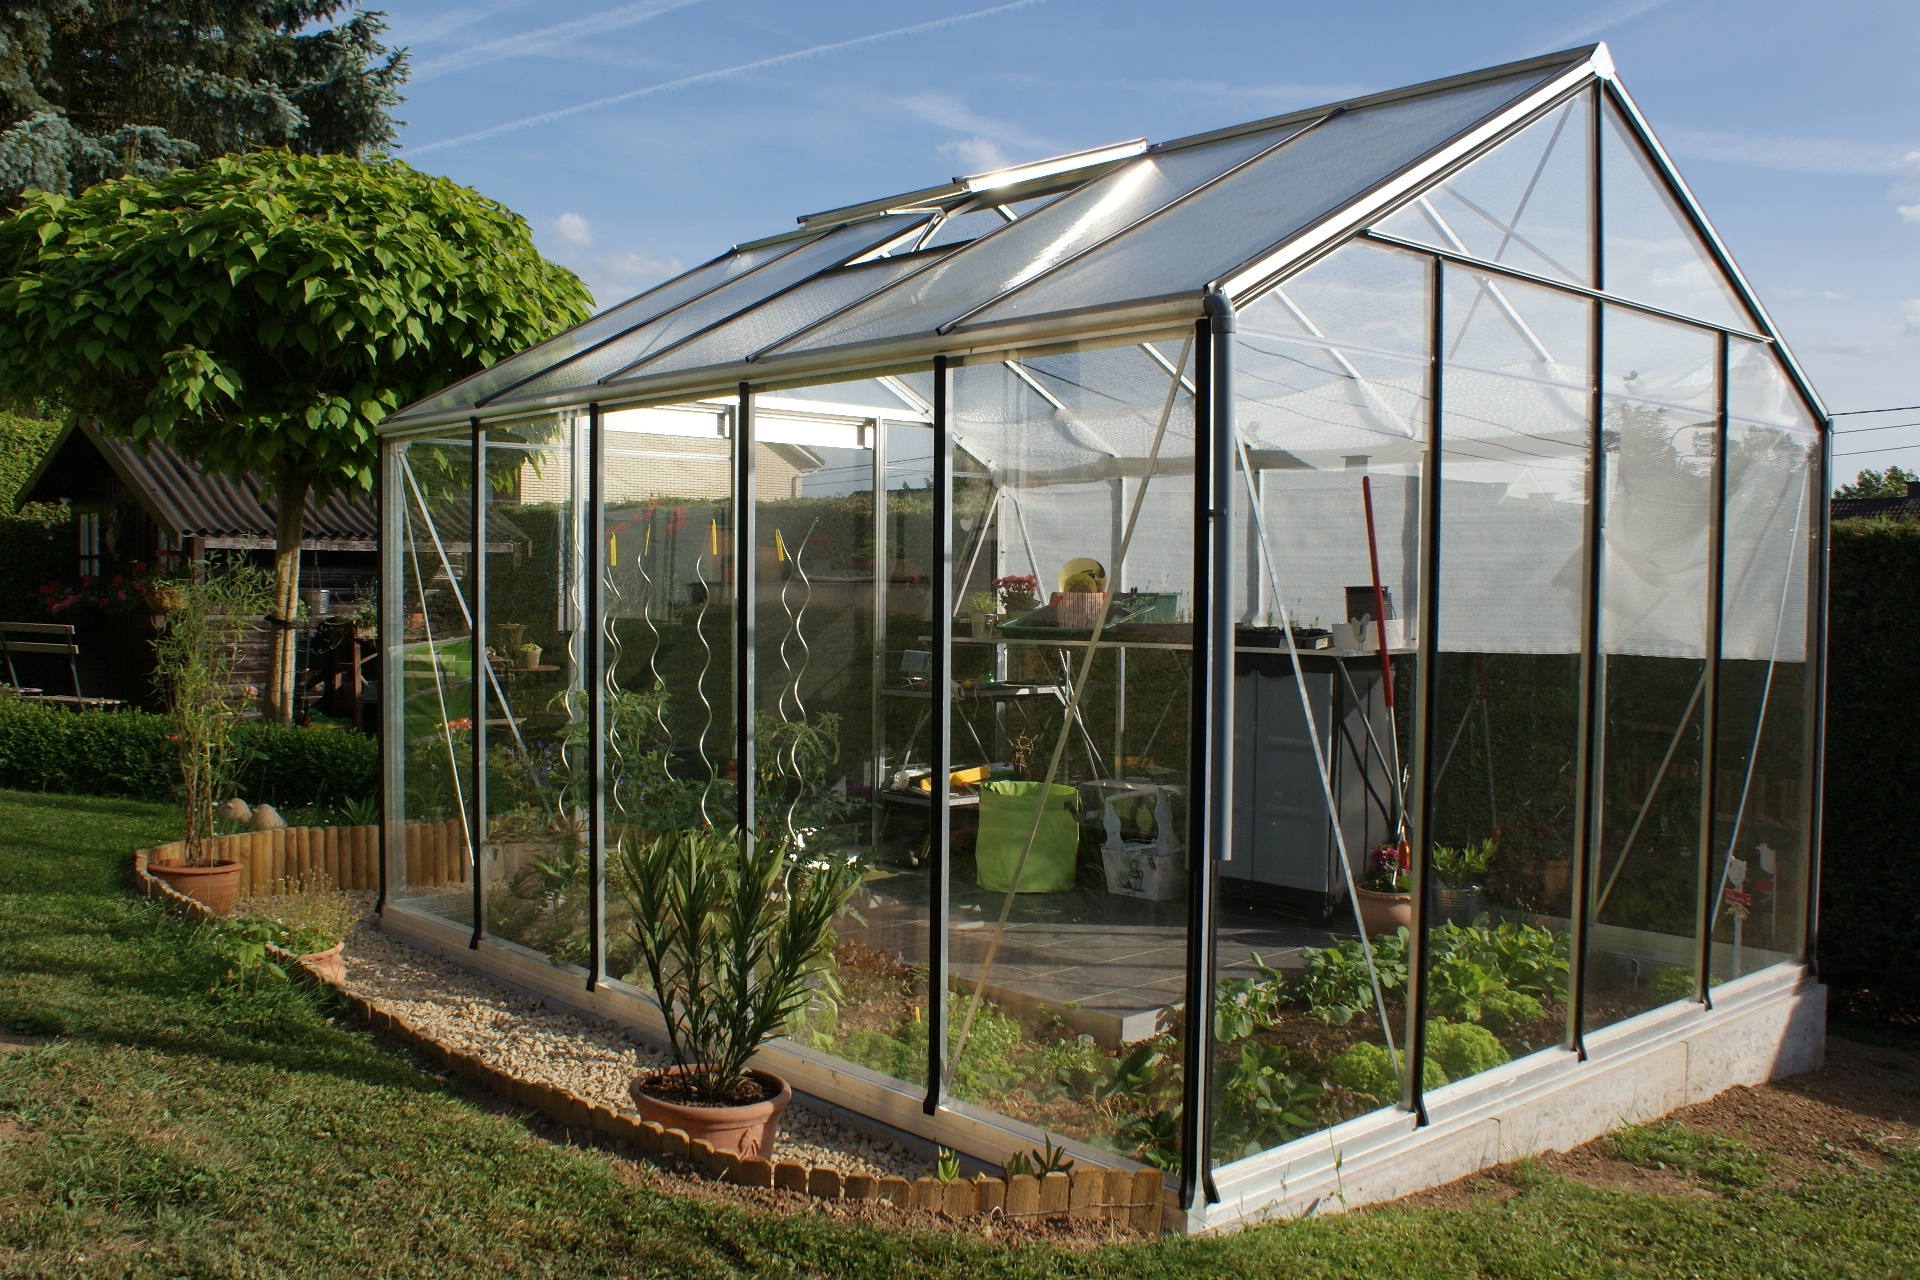 Conception et installation de serre de jardin et véranda